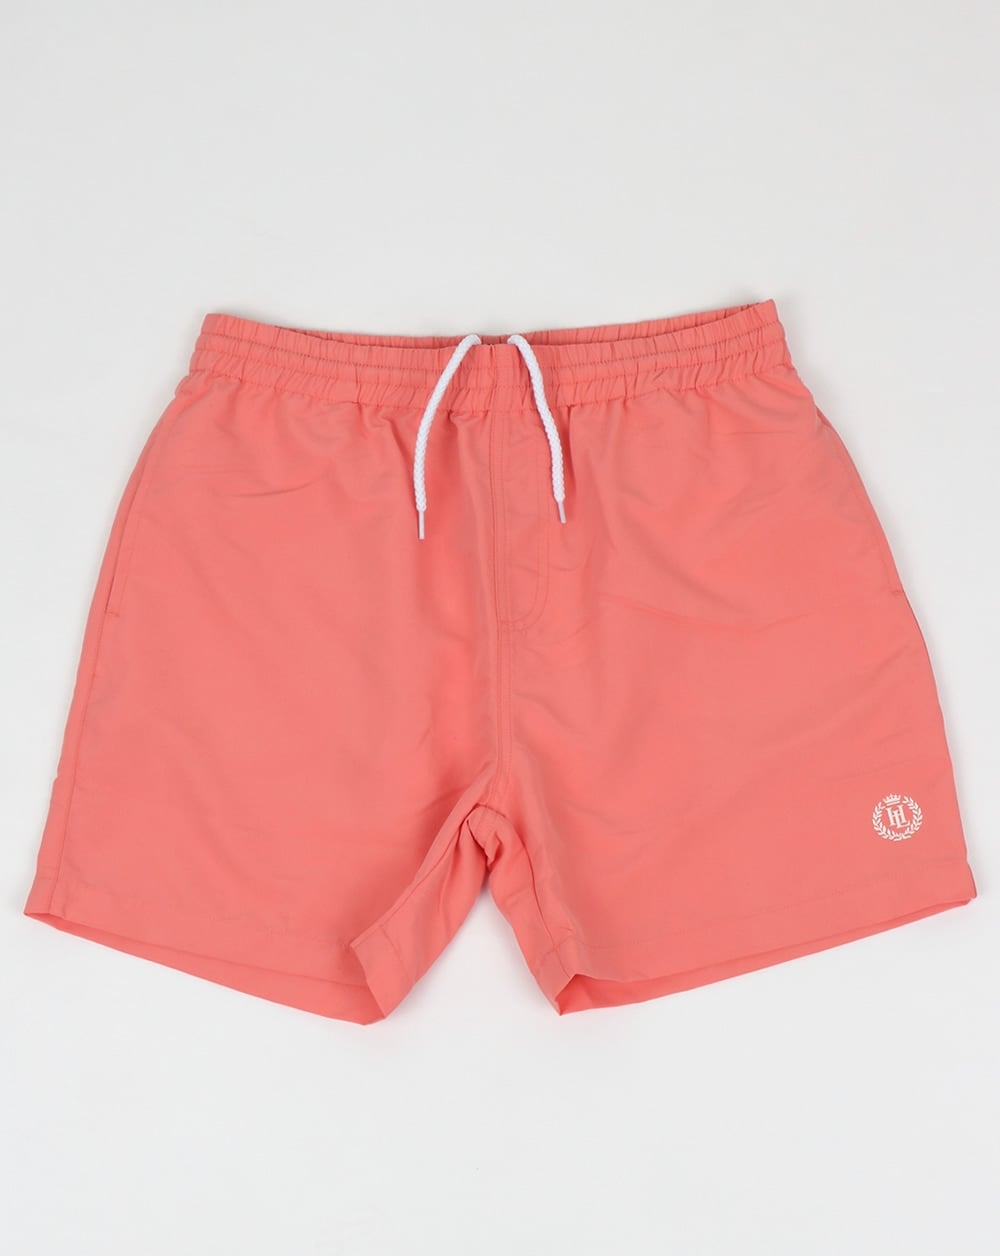 Coralrif Neon Shorts Salmon Pink